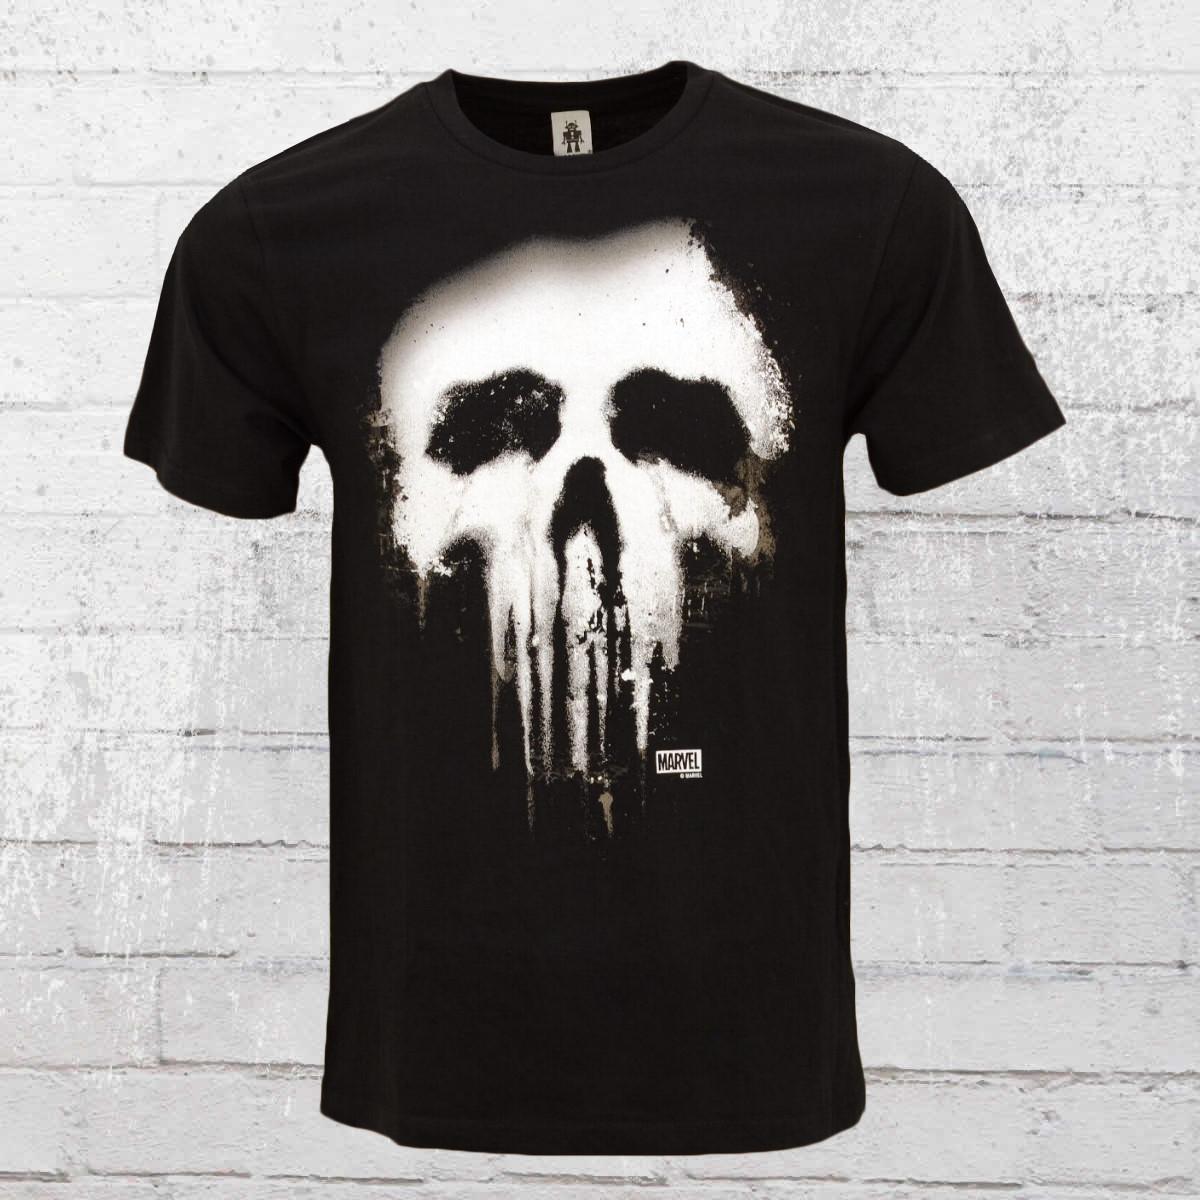 a1b42ebeb132cb Order now | Logoshirt Male T-Shirt Punisher New Skull black